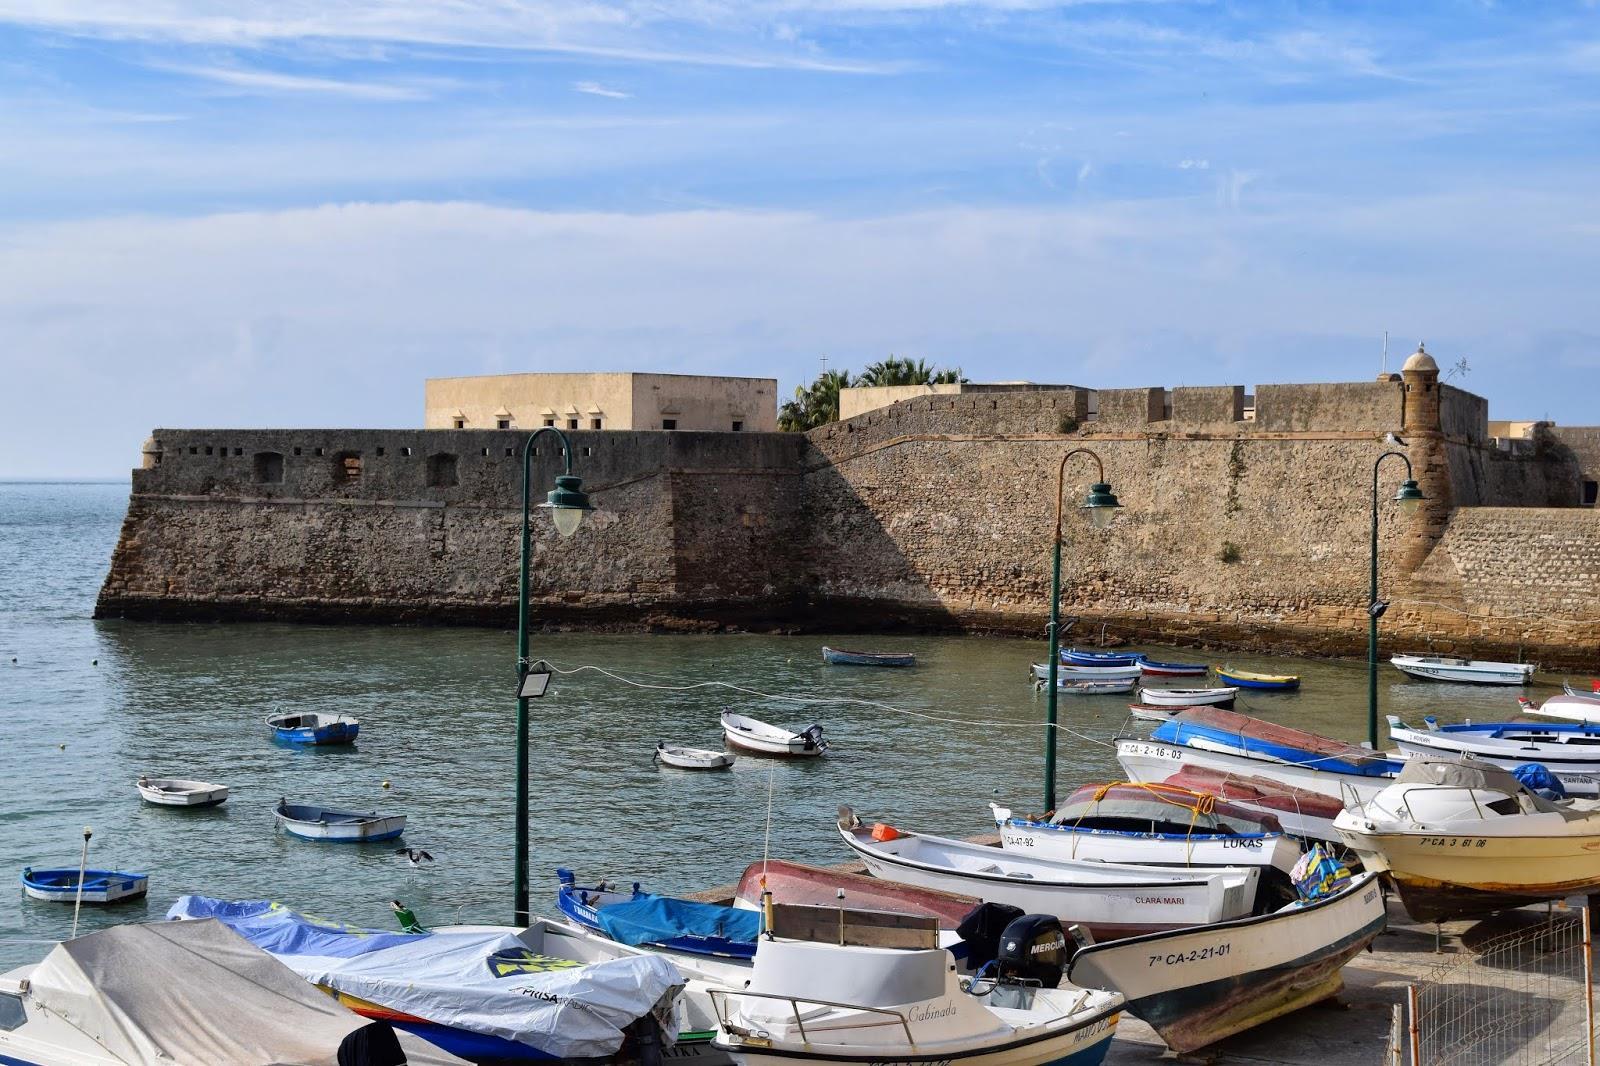 Free Tour Caleta y Castillos de Cádiz